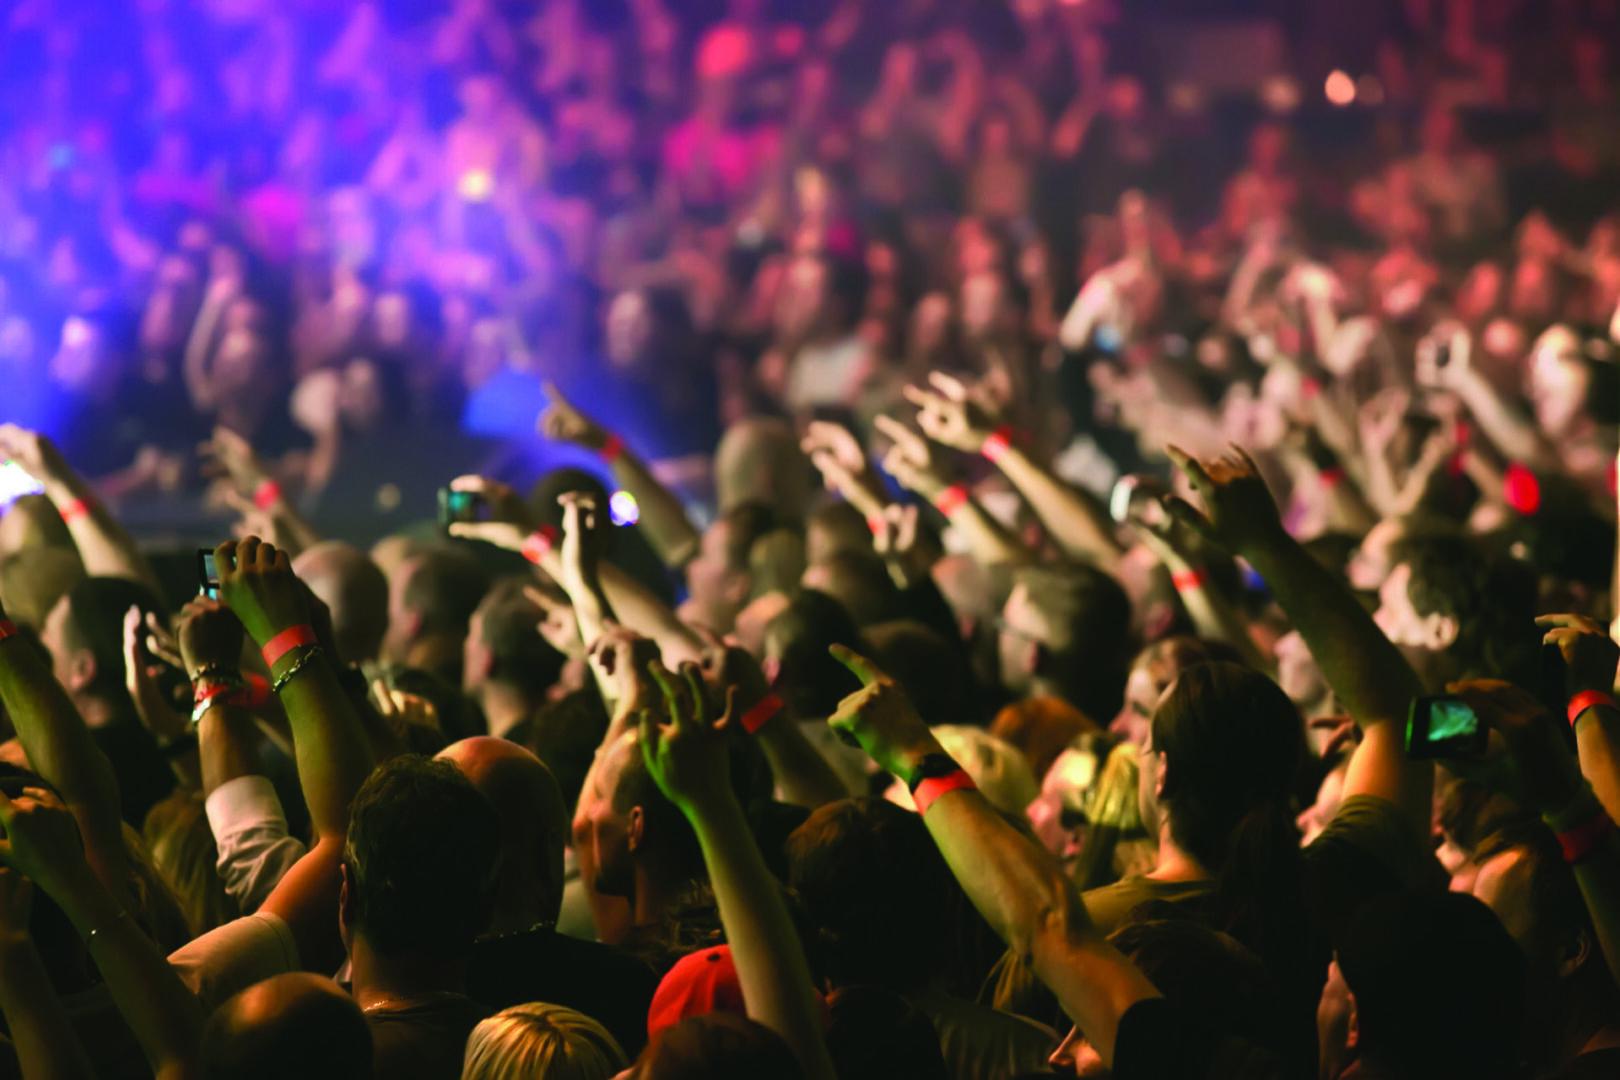 Lifestyle_Concert